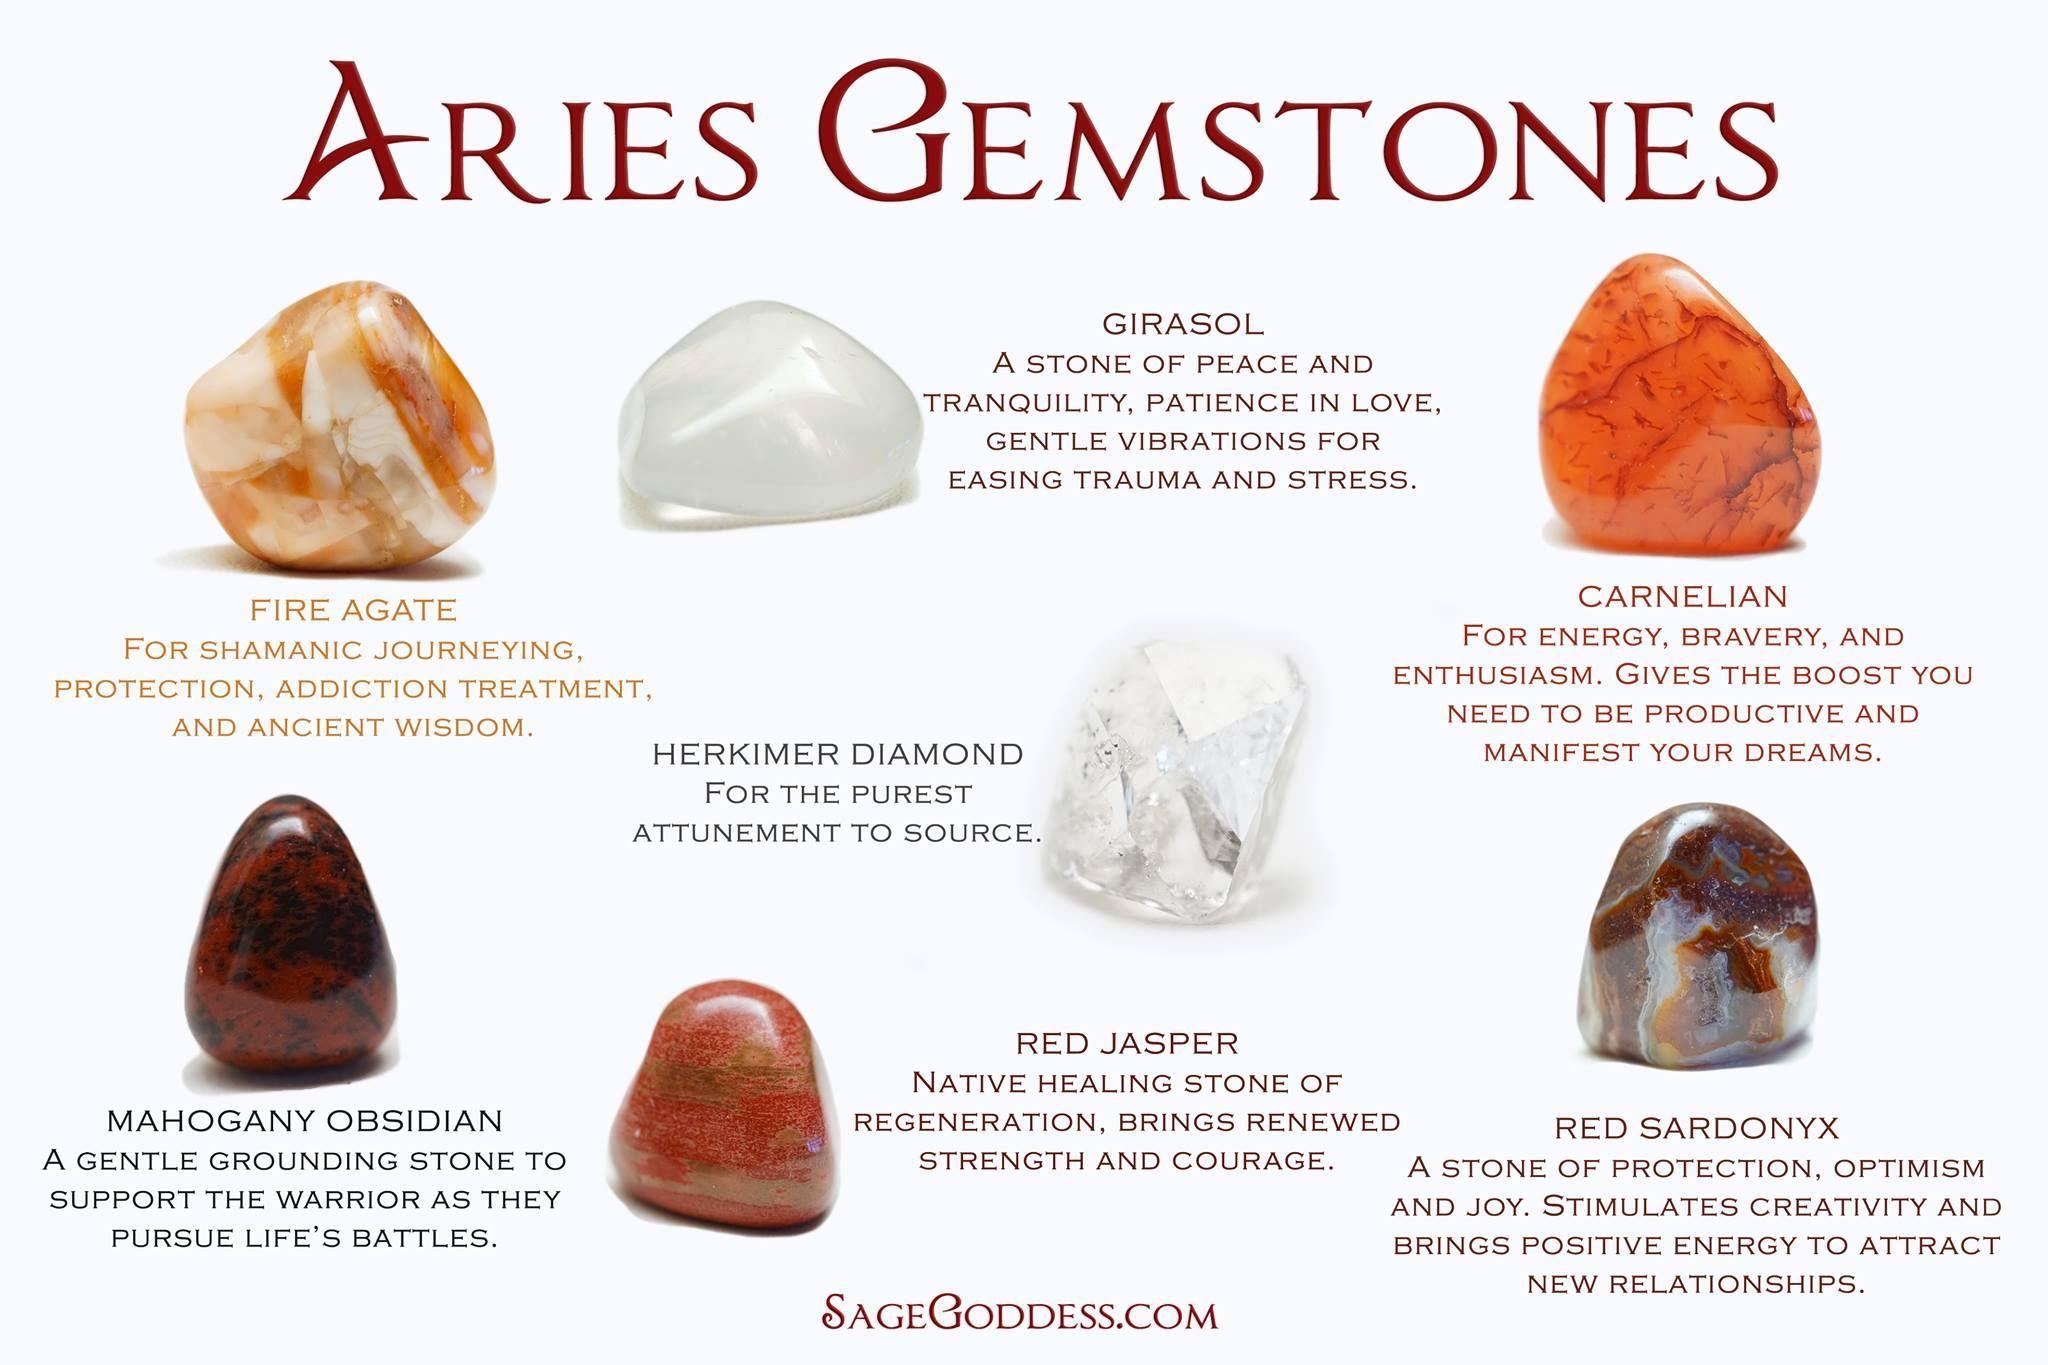 : Custom Jewels Gems Air Forces 1 | Clear Gems